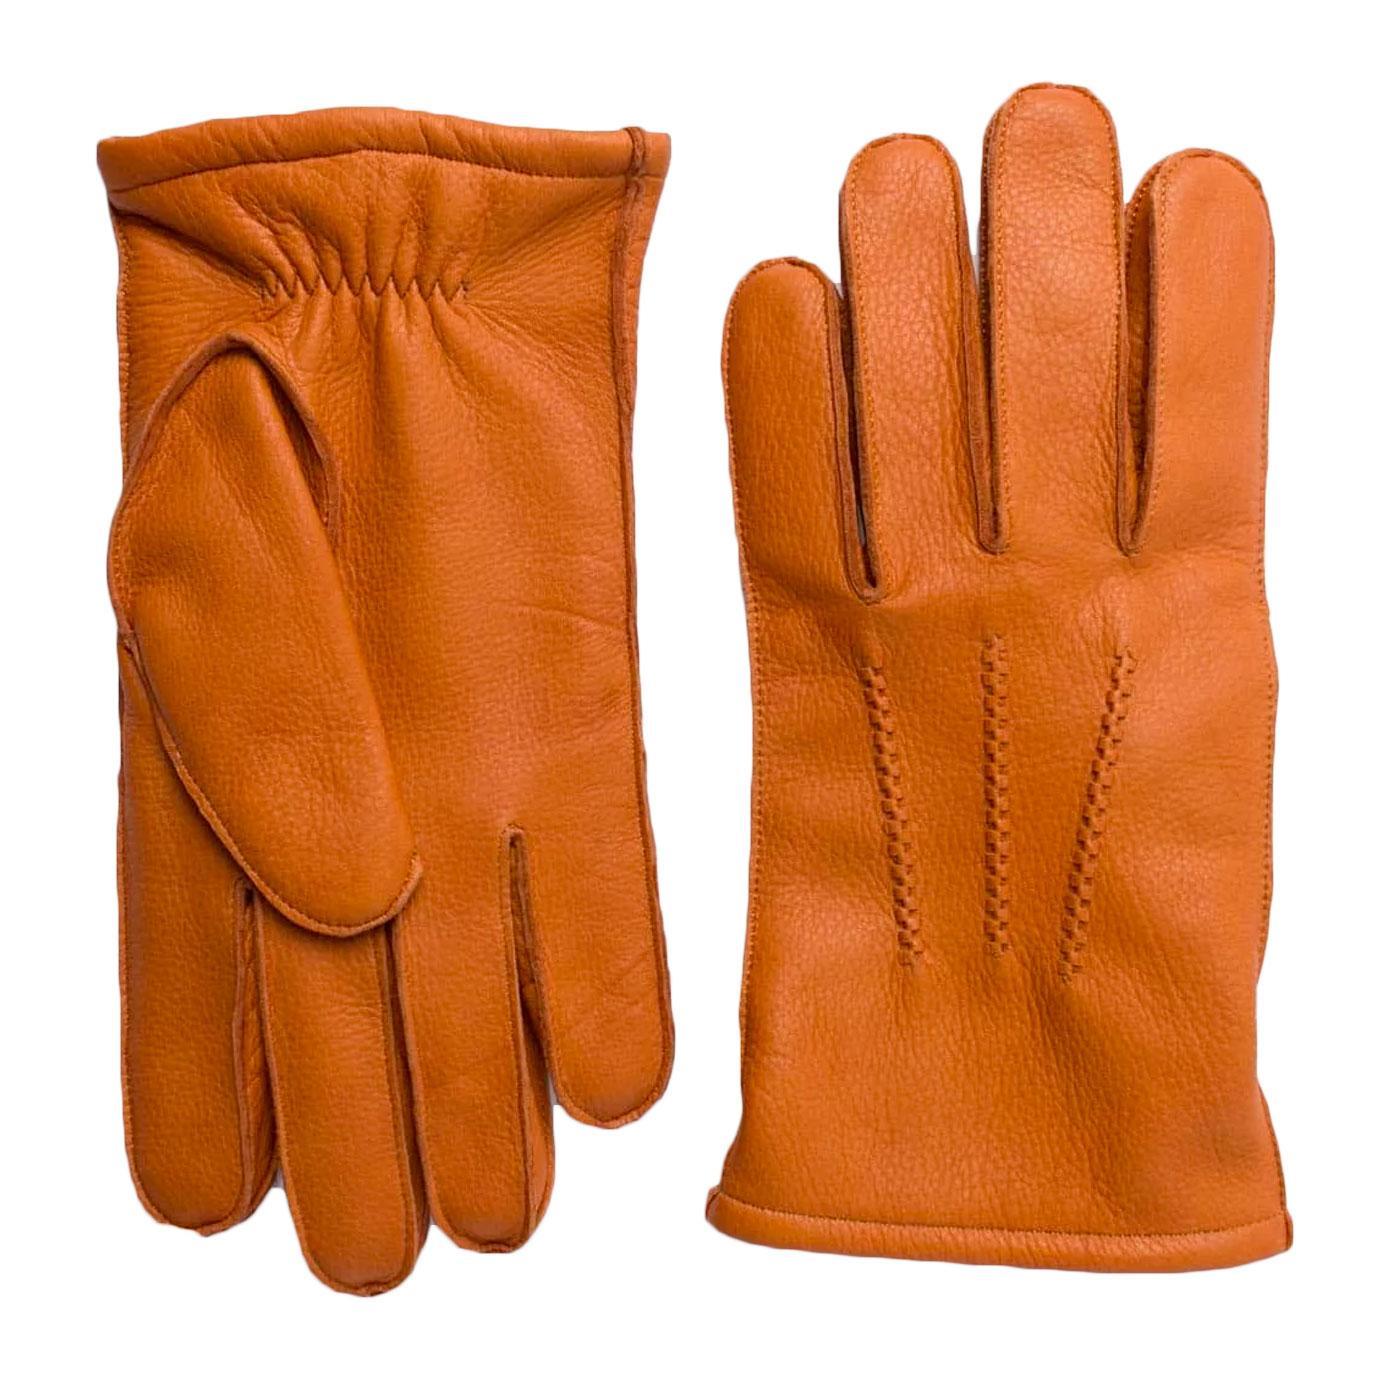 Winston FAILSWORTH Men's Retro Leather Gloves TAN